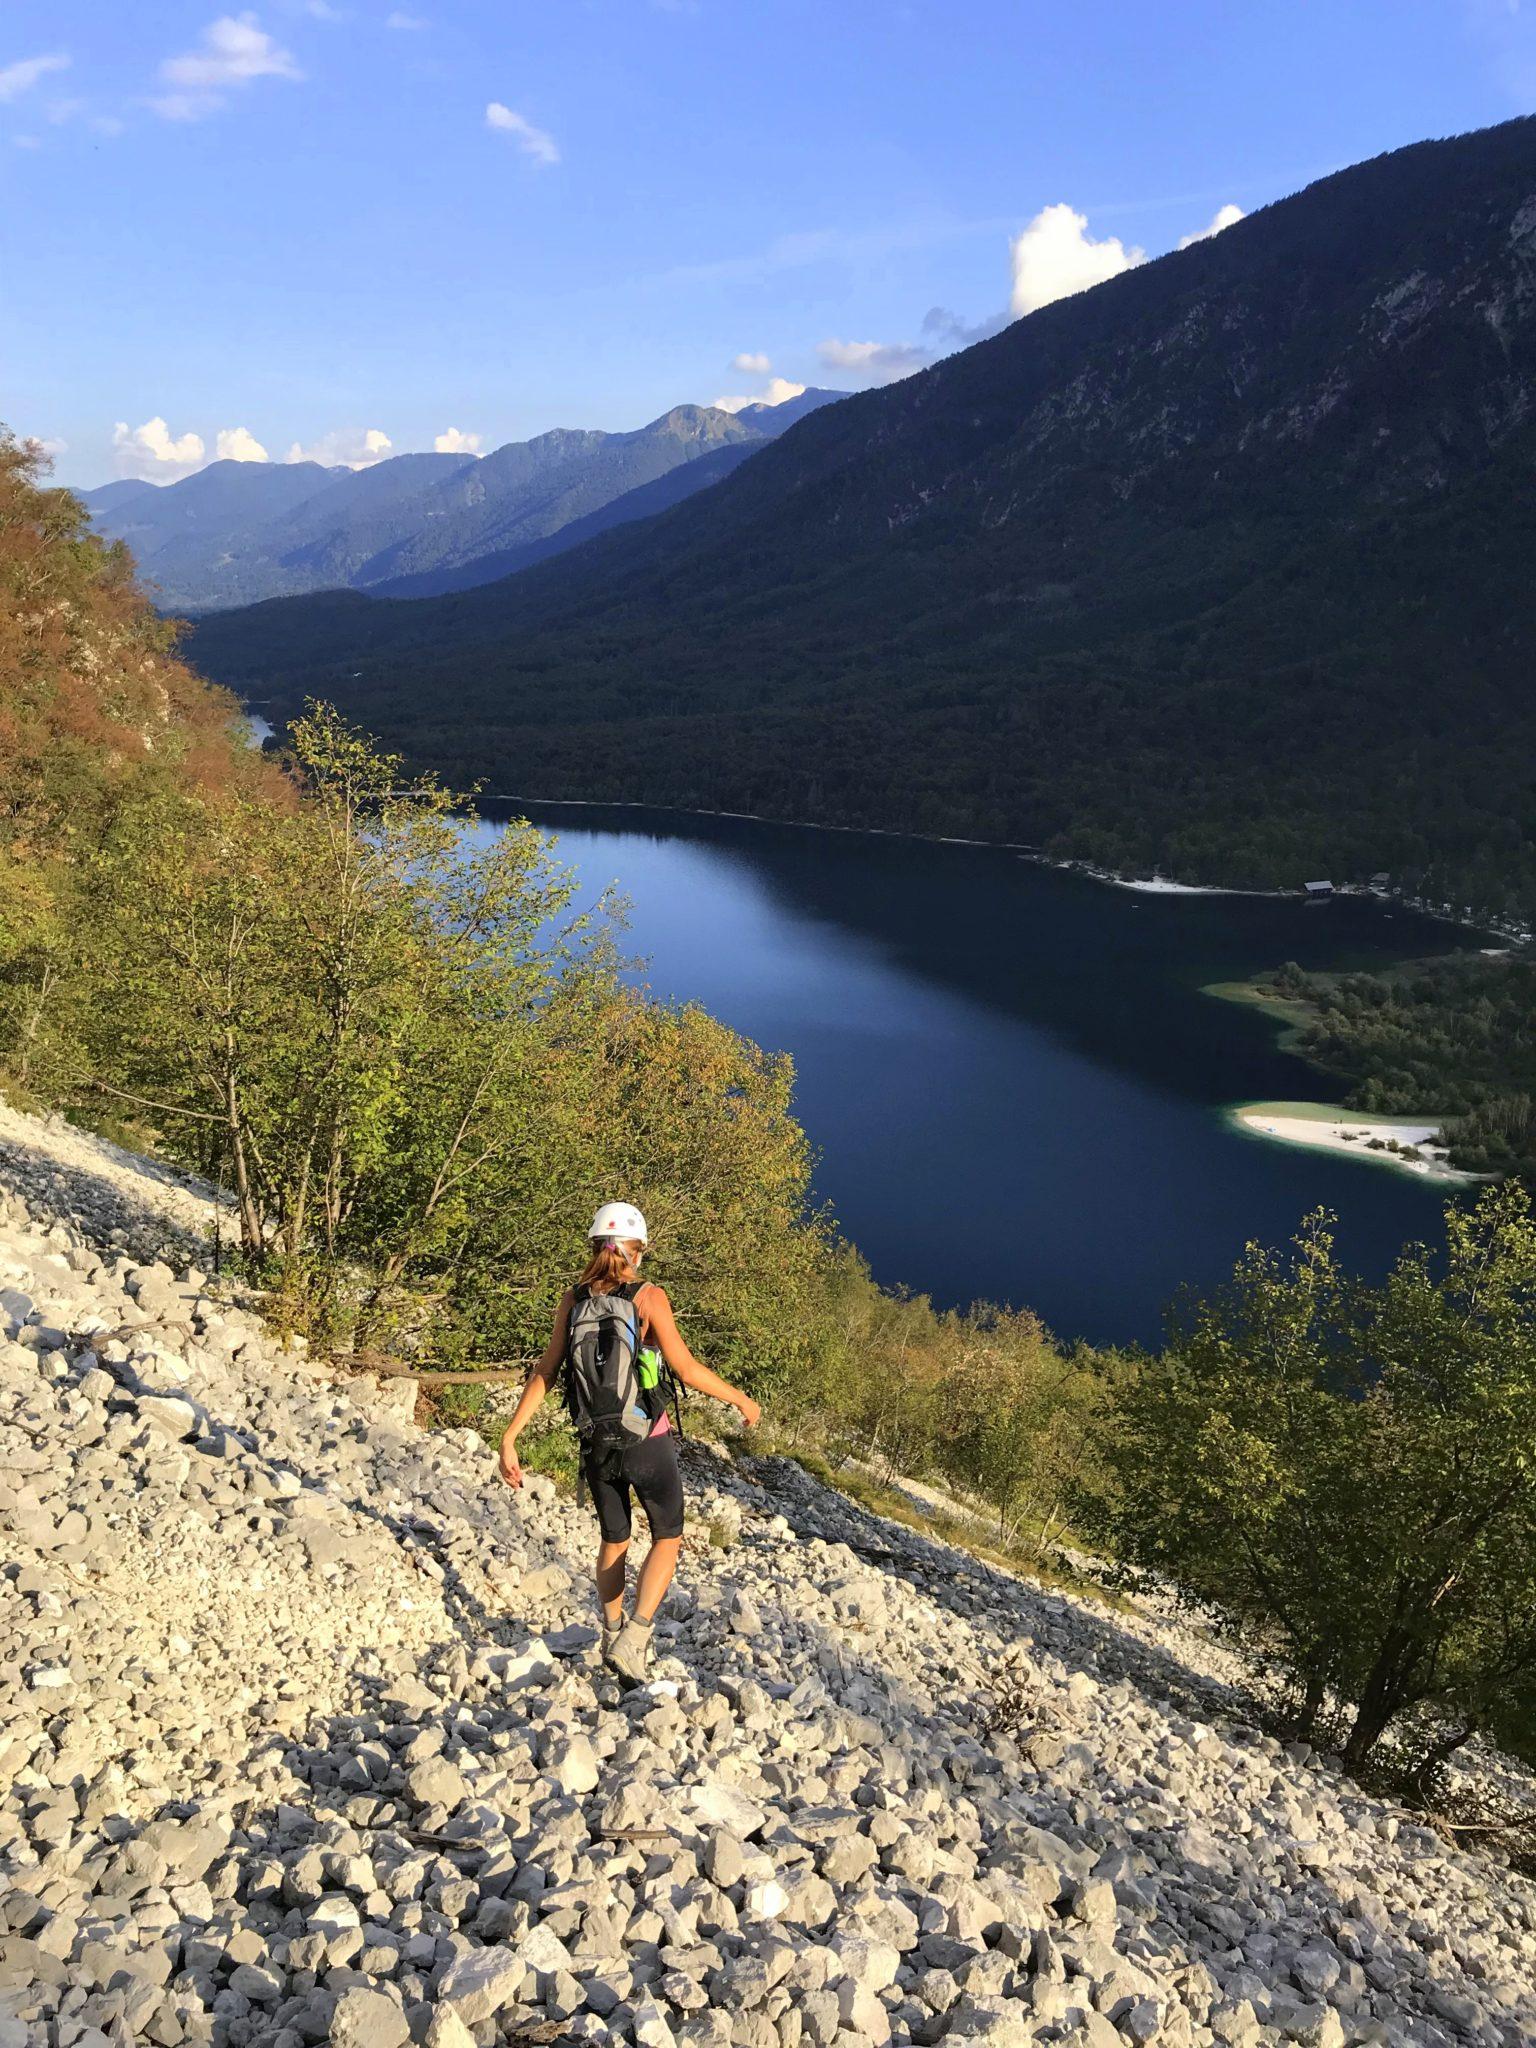 Hiking down the via ferrata Ožarjeni Kamen above Lake Bohinj, Slovenia